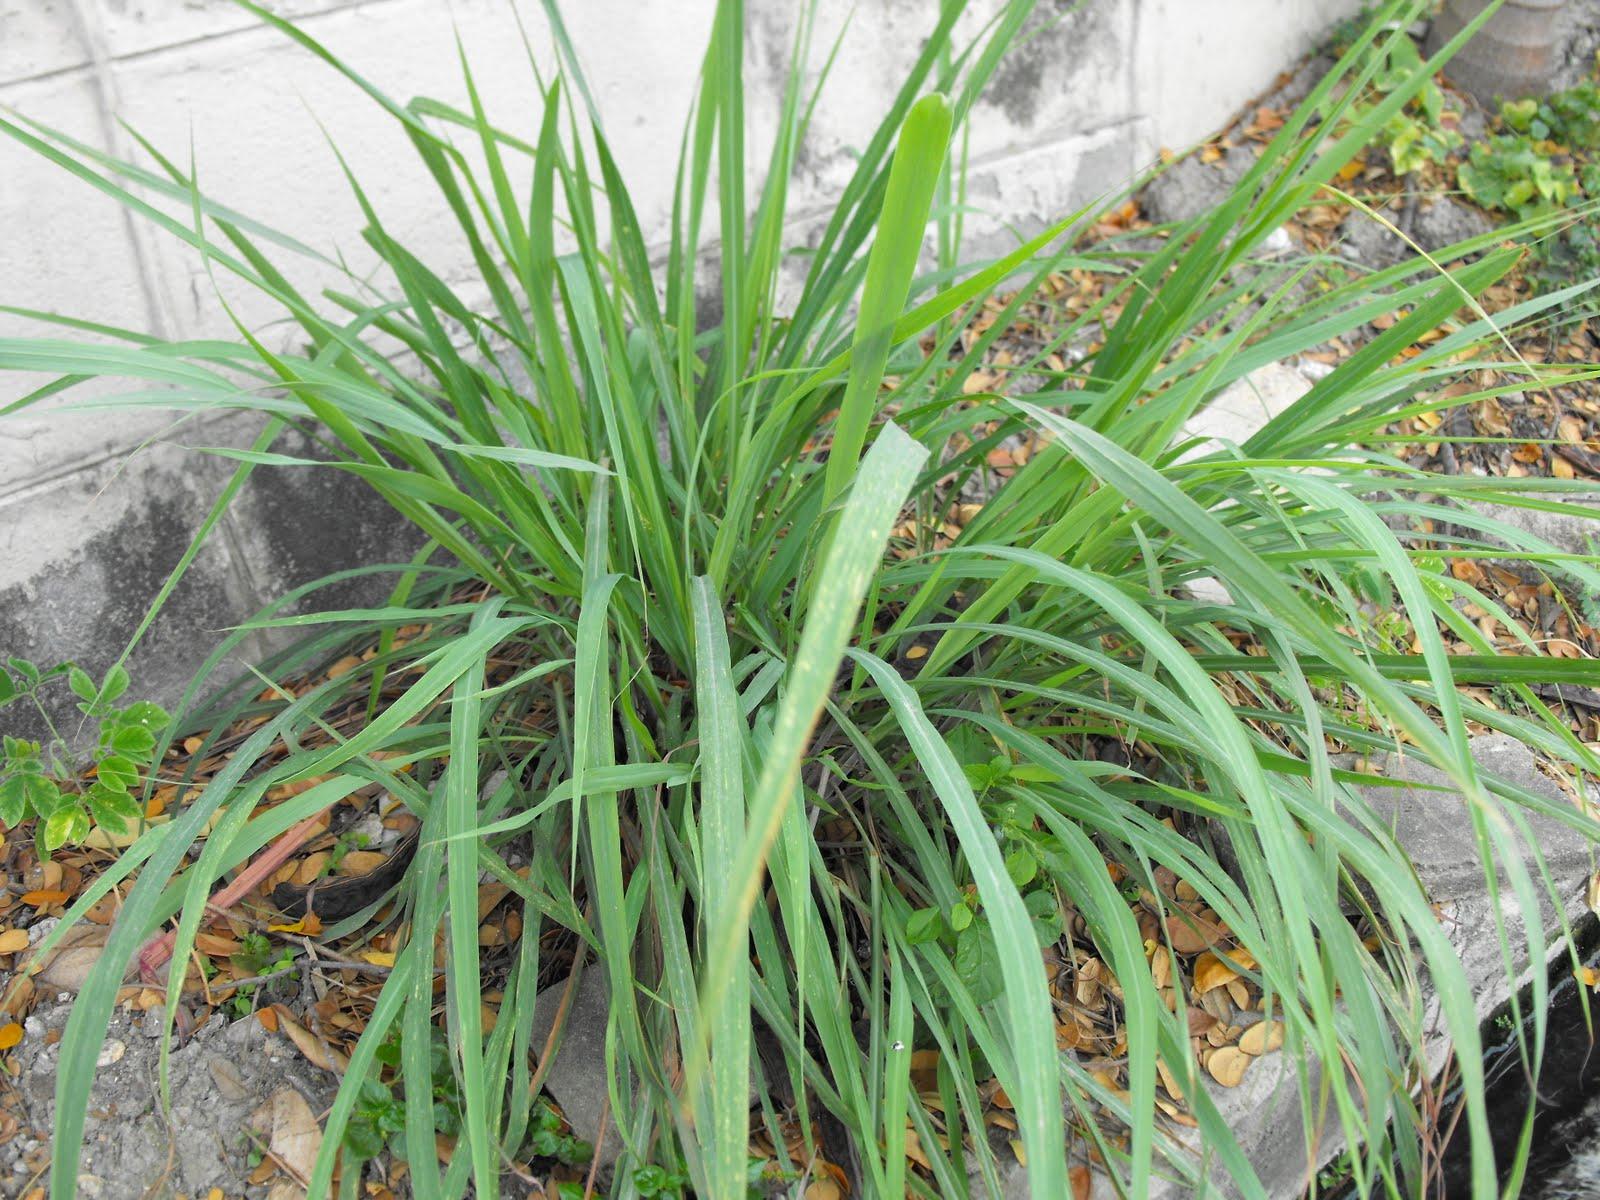 HERBAL MEDICINE: Health Benefits of Lemon Grass